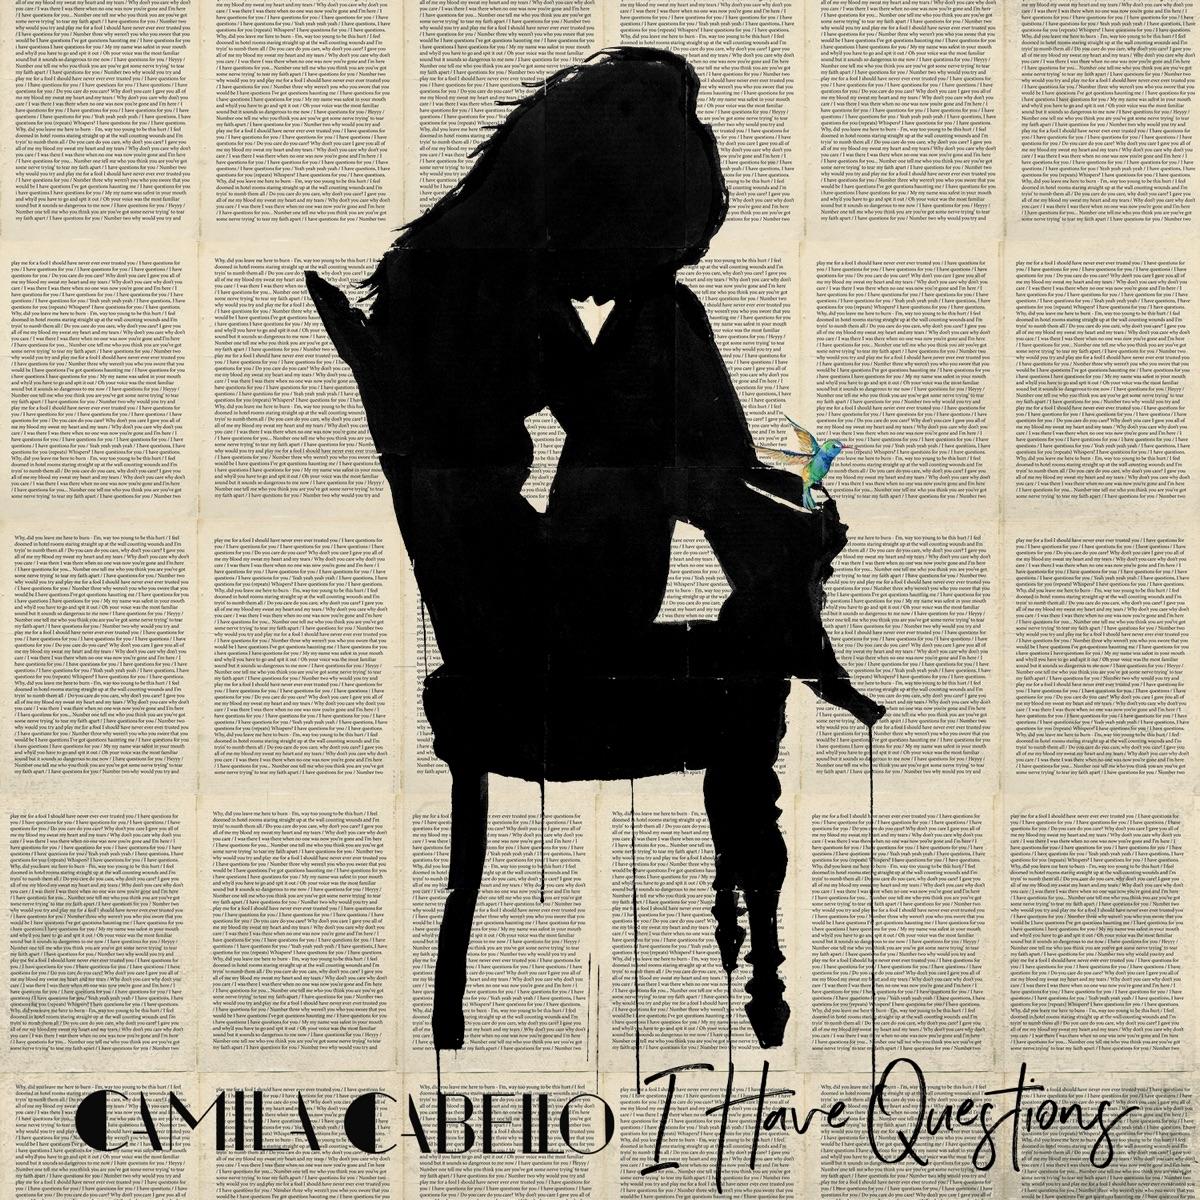 I Have Questions - Single Camila Cabello CD cover